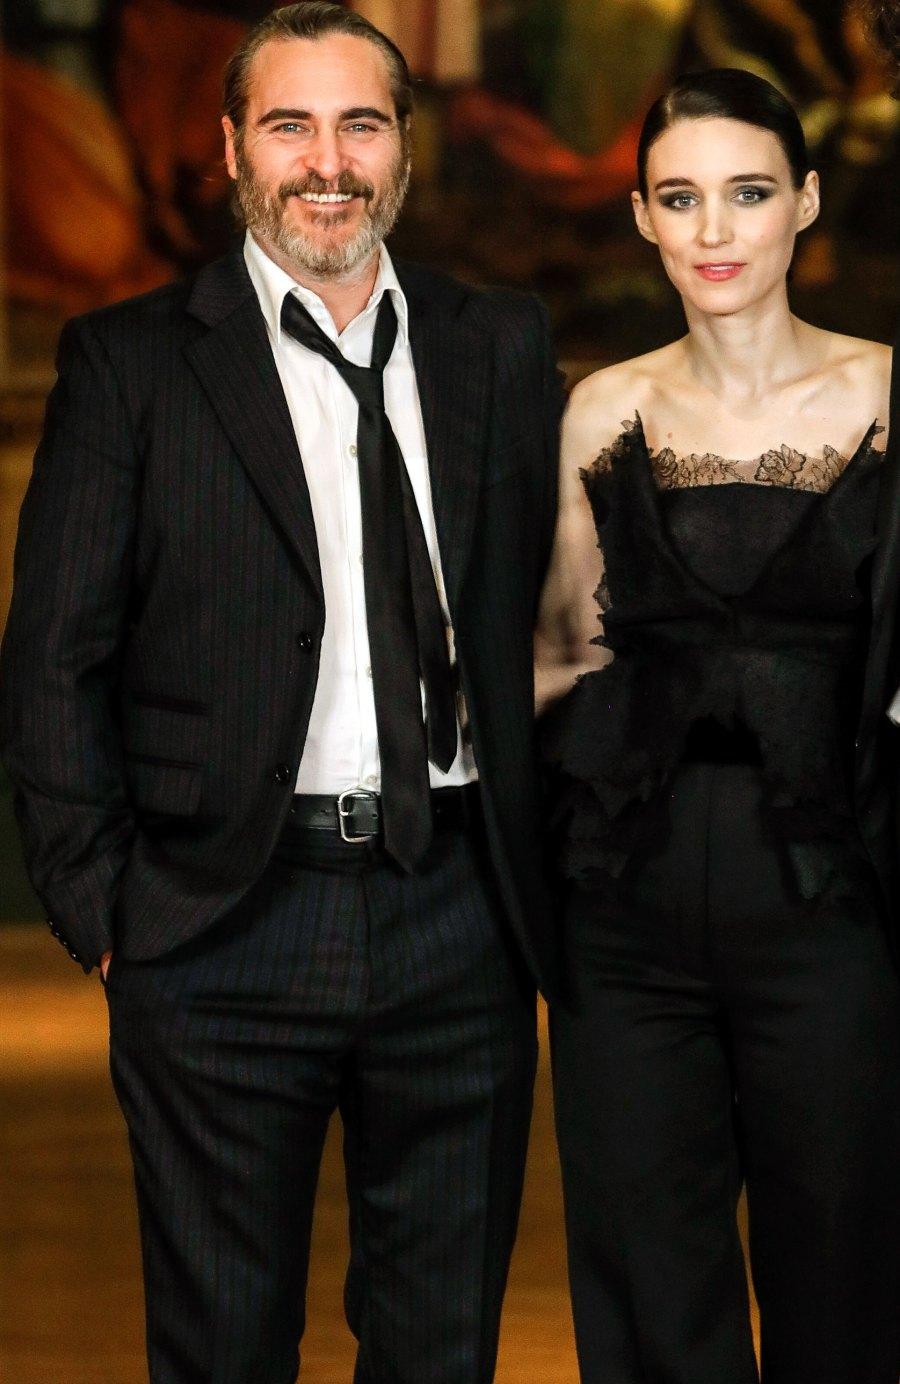 Rooney Mara Joaquin Phoenix celebrity engagements 2019